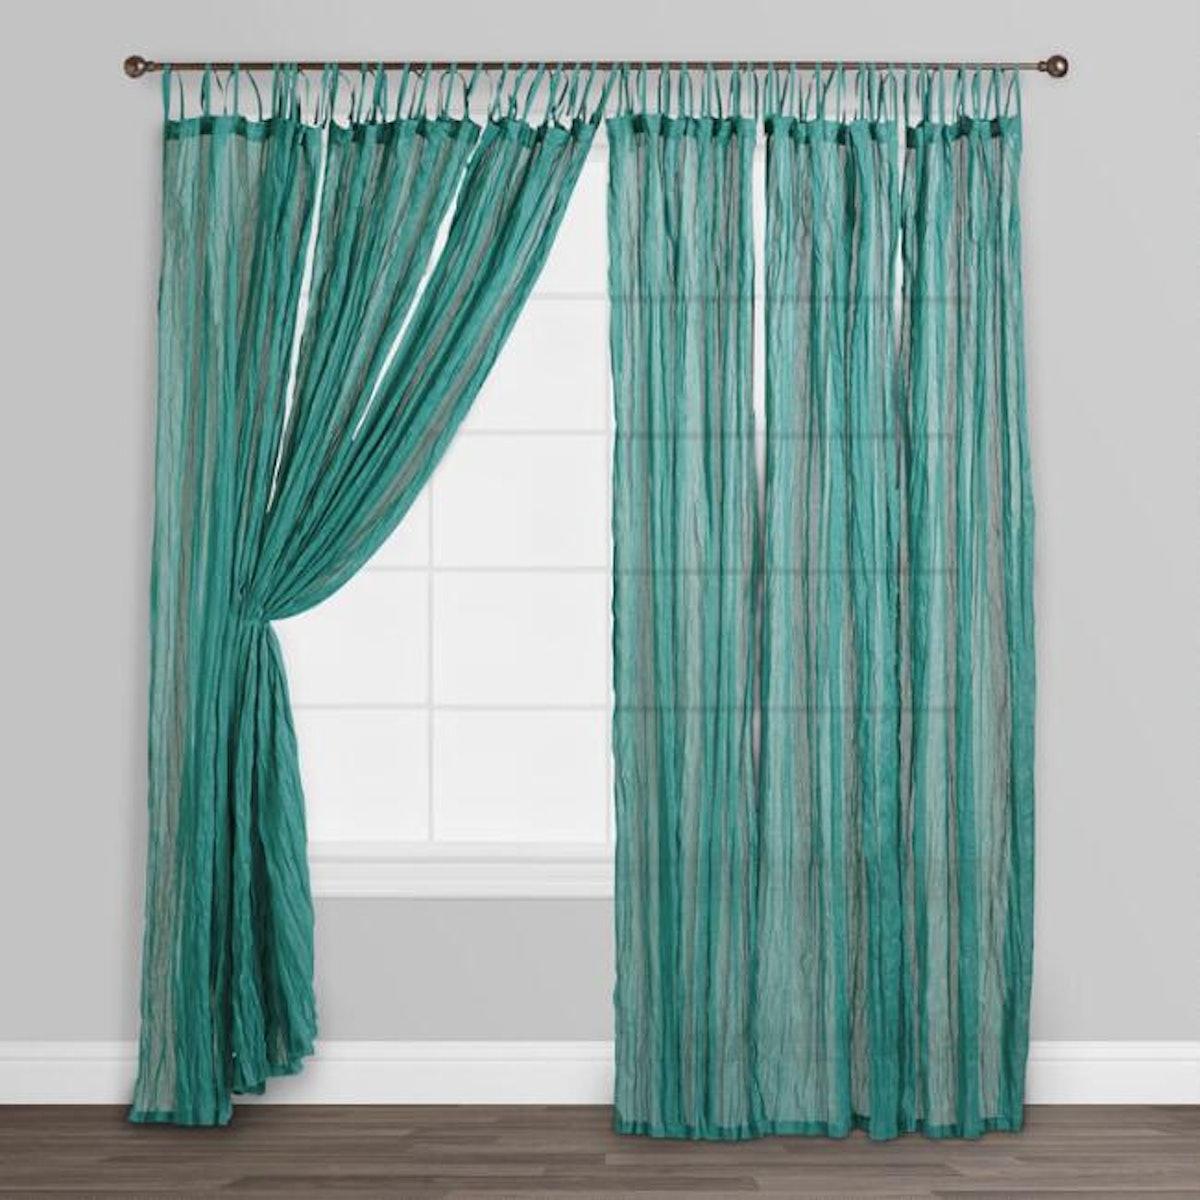 Blue Crinkle Voile Cotton Curtains